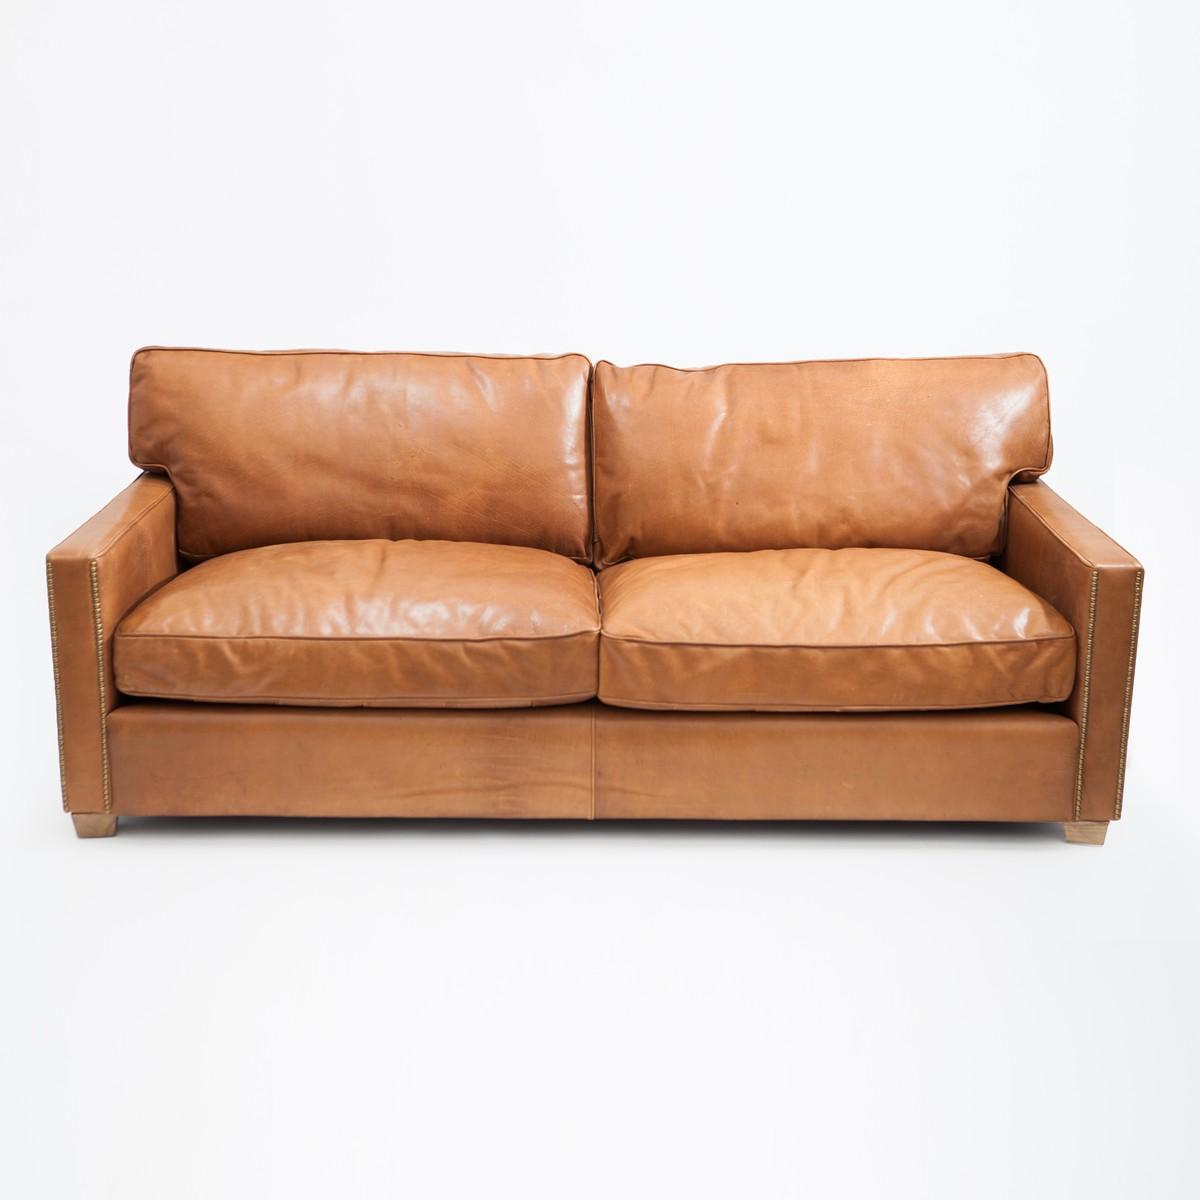 halo creative canap viscout william 3 places brun noisette 222x101x88cm. Black Bedroom Furniture Sets. Home Design Ideas